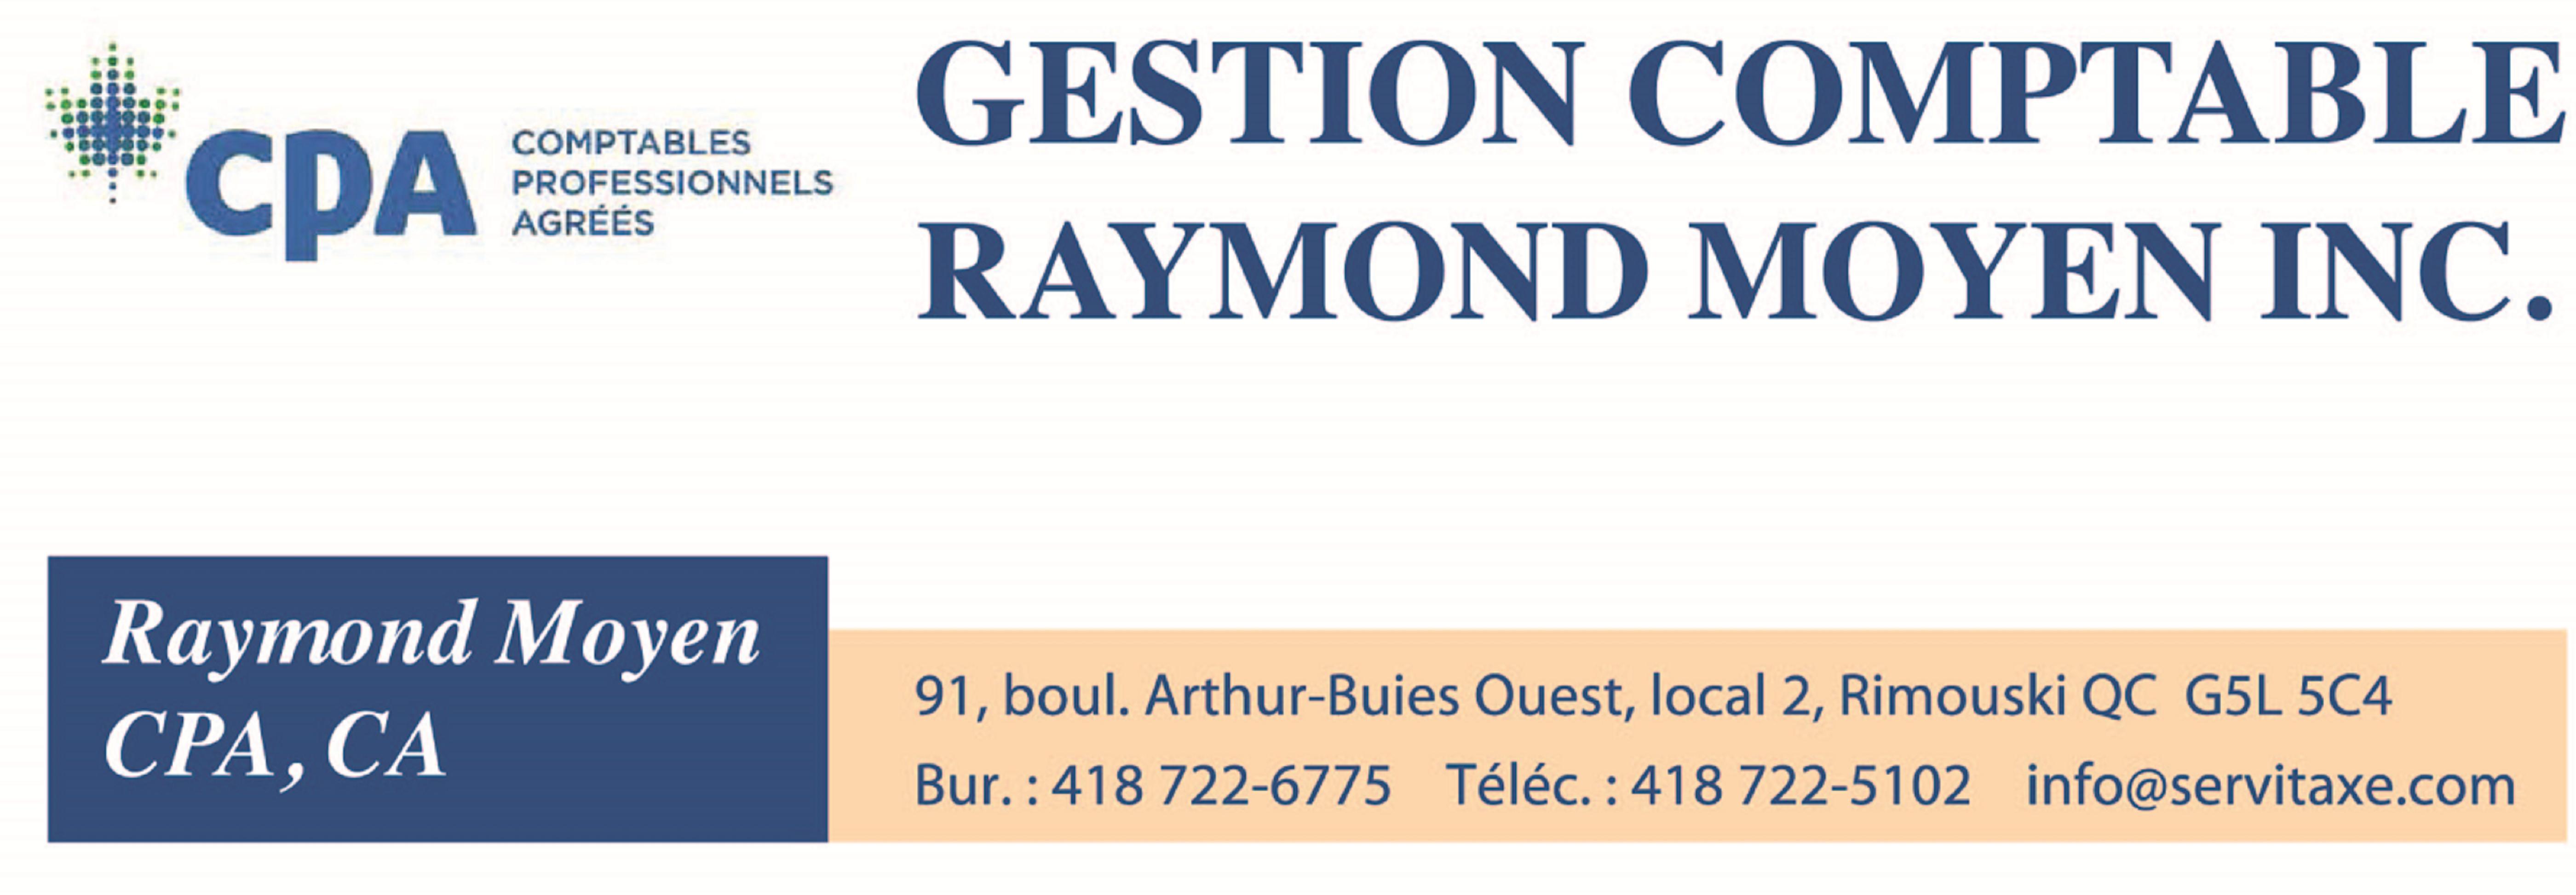 Gestion comptable Raymond Moyen inc.